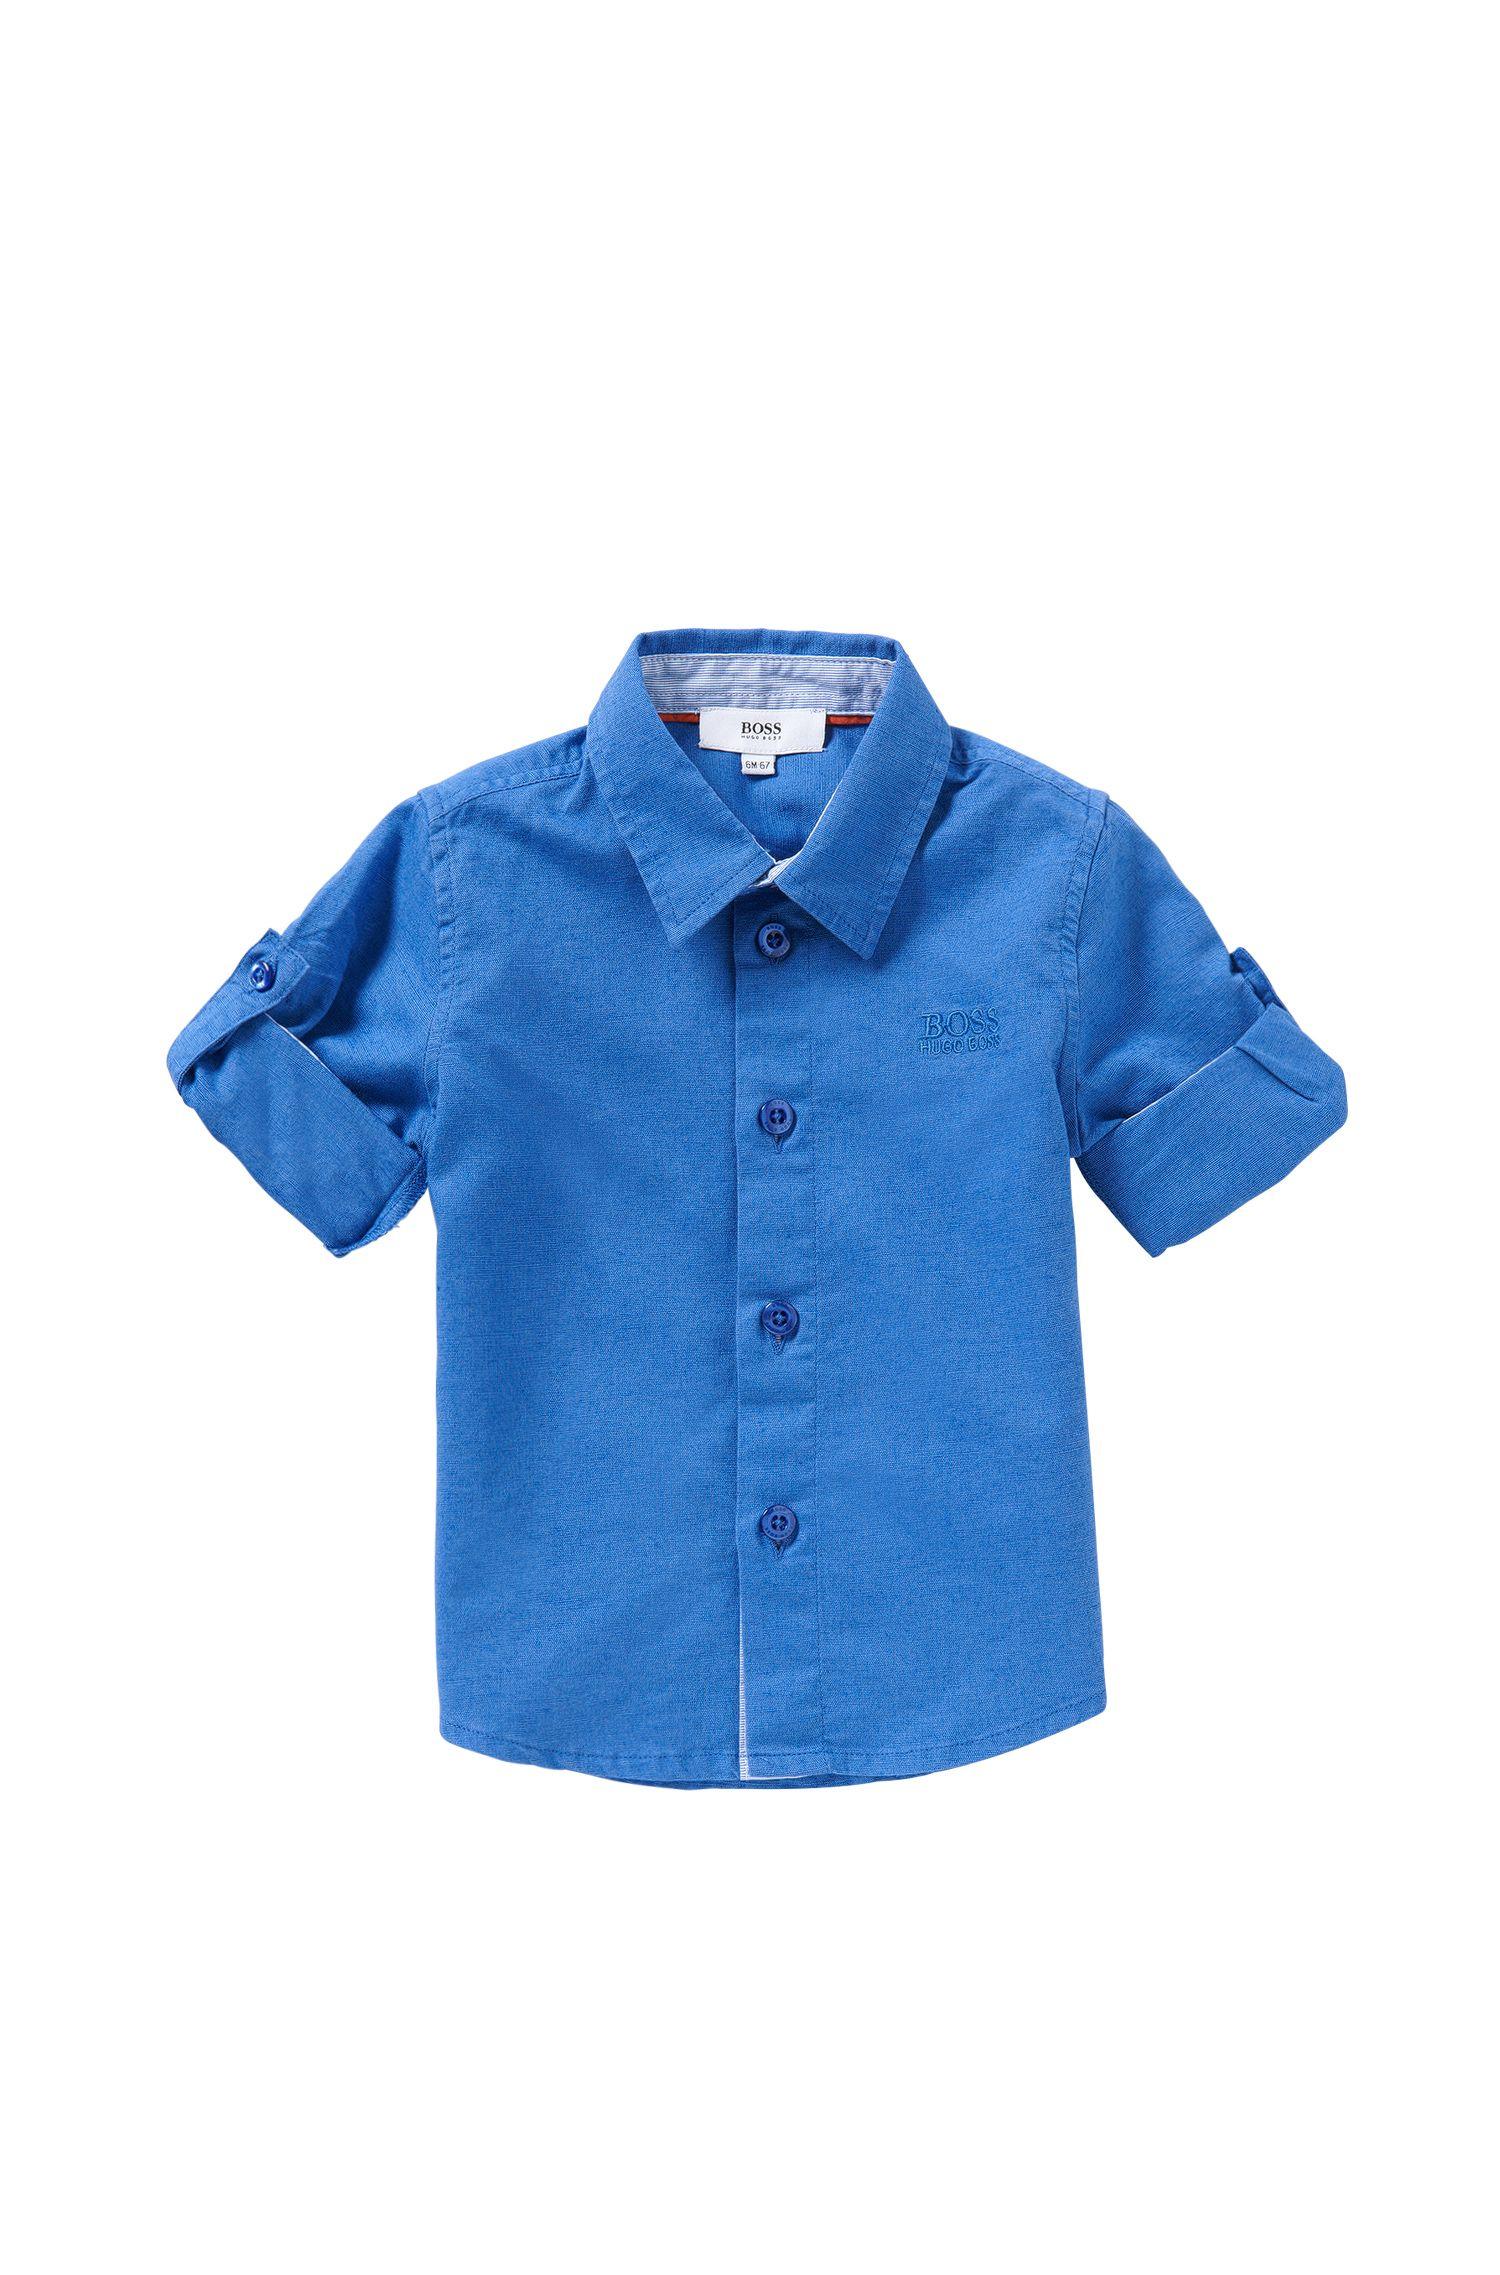 'J05465'   Toddler Cotton Button Down Shirt